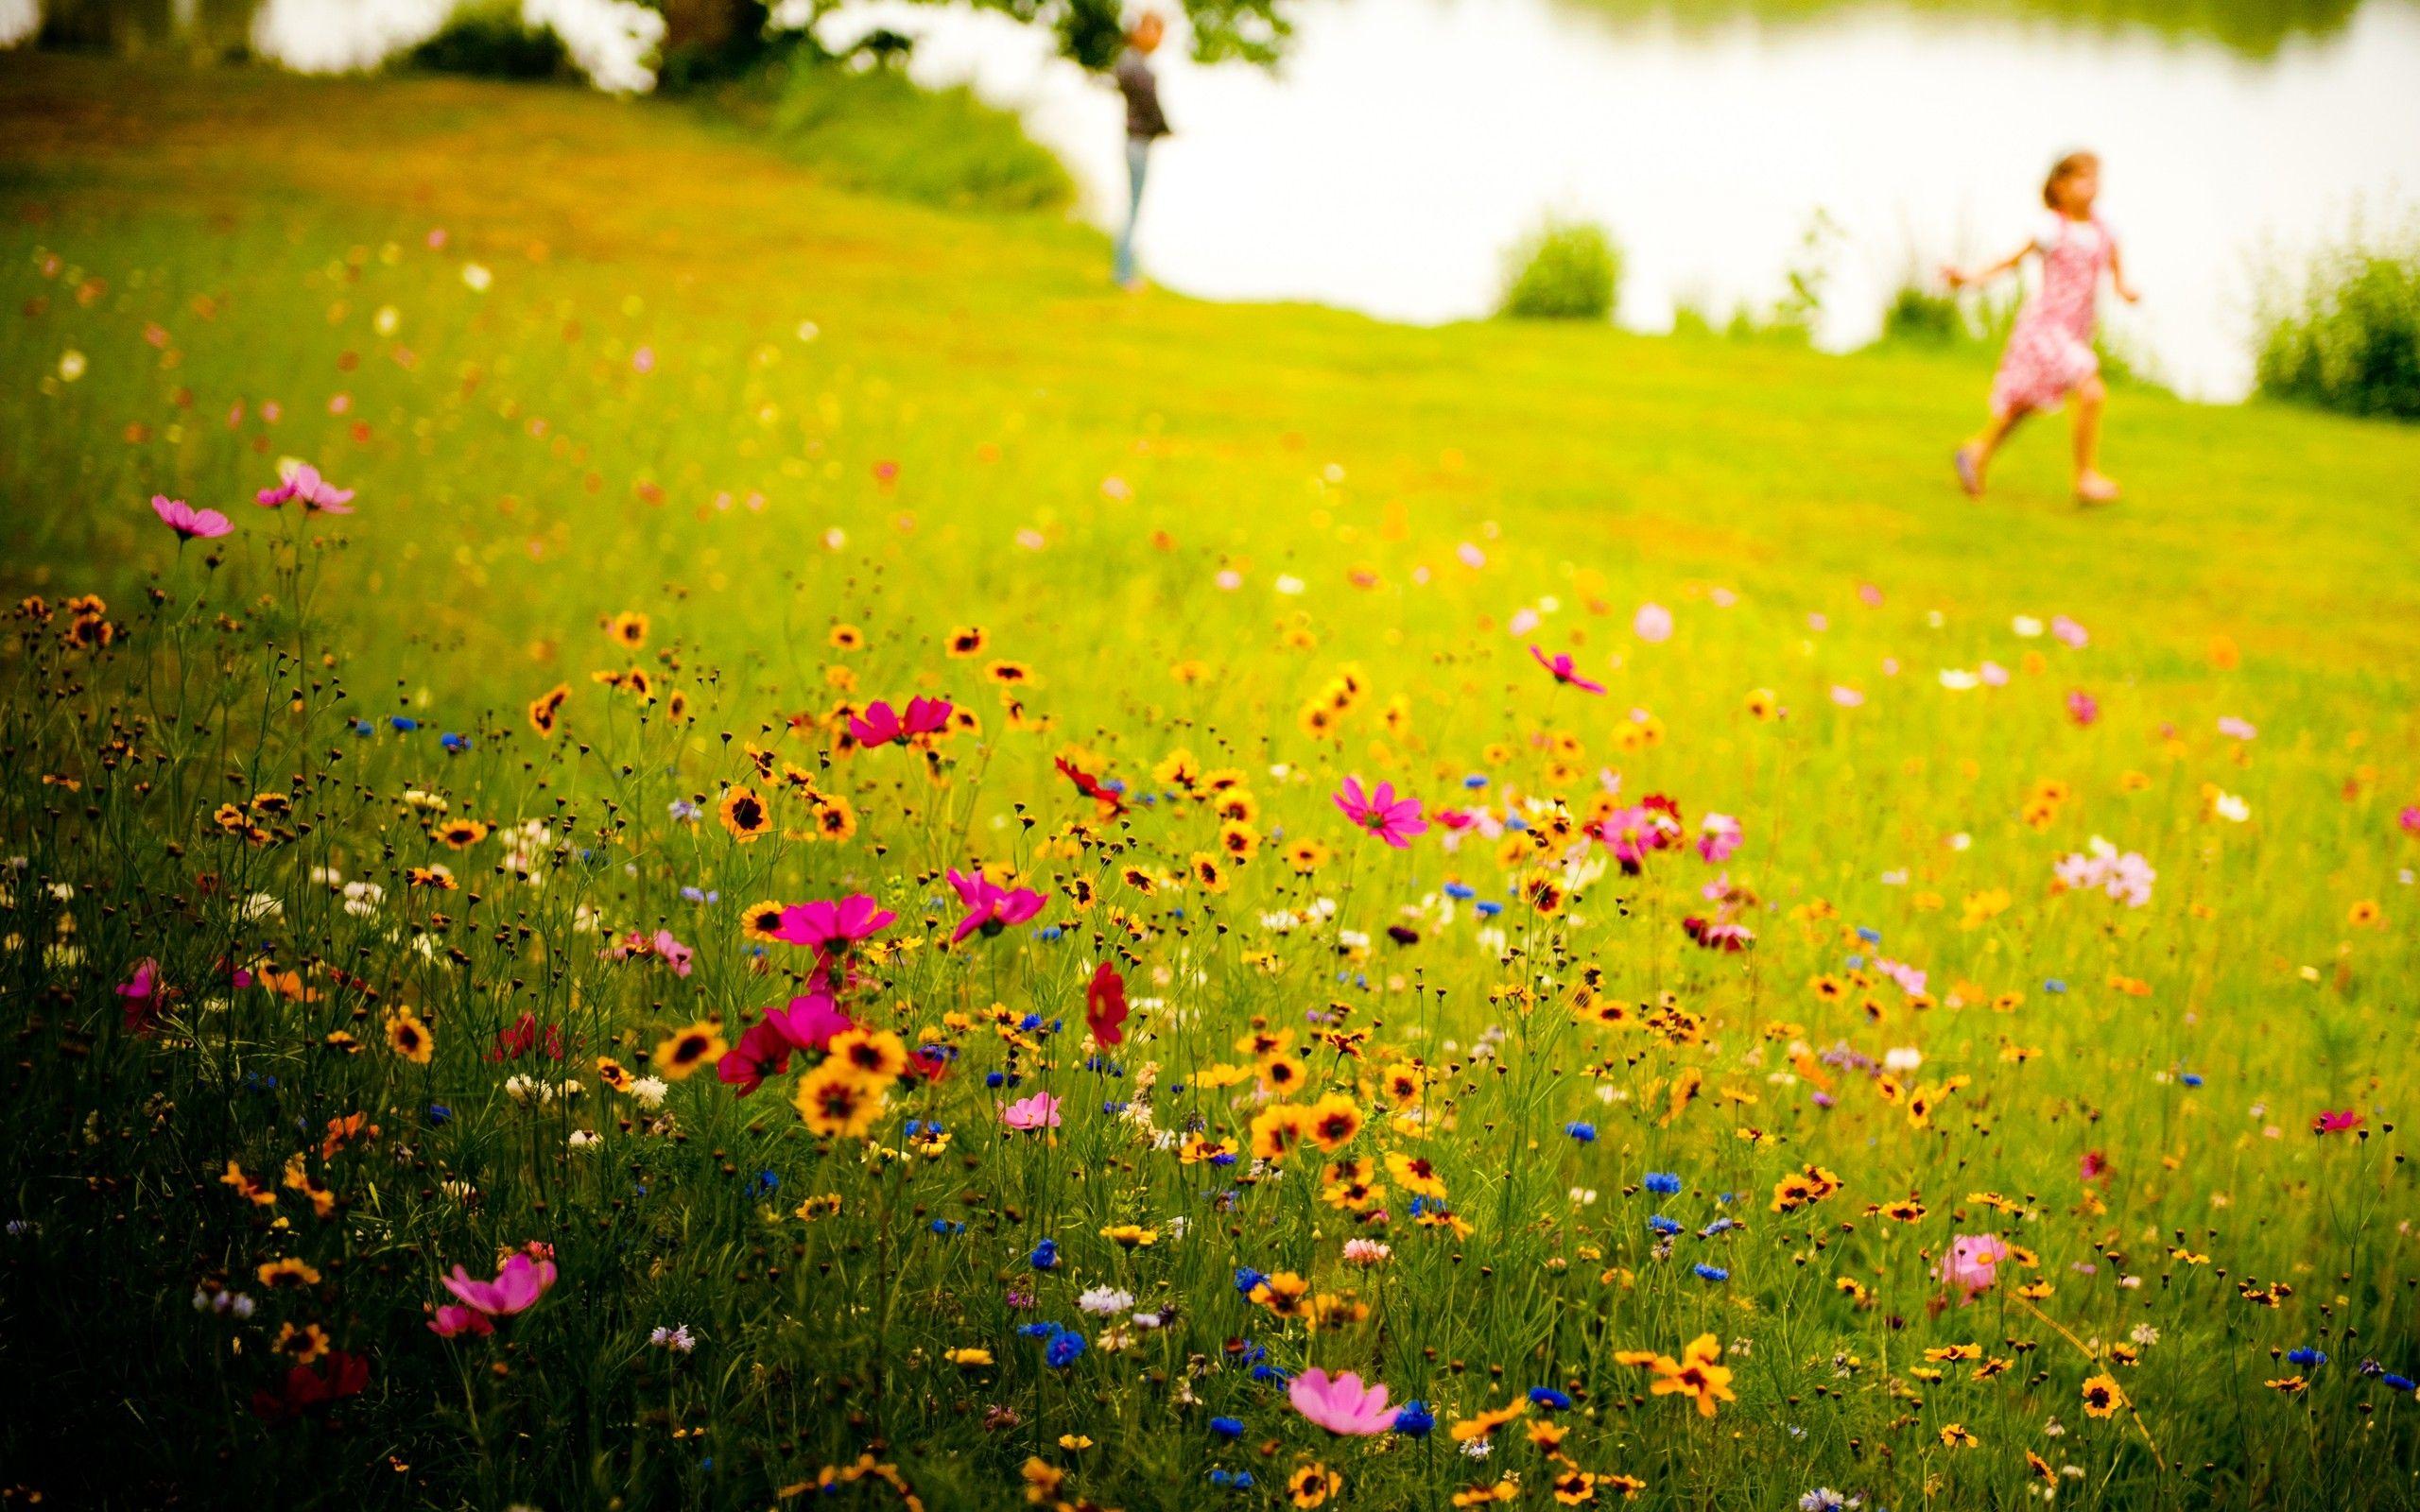 Landscapes Flowers Children Grass Meadows Wildflowers Nature Wild Flowers Flower Field